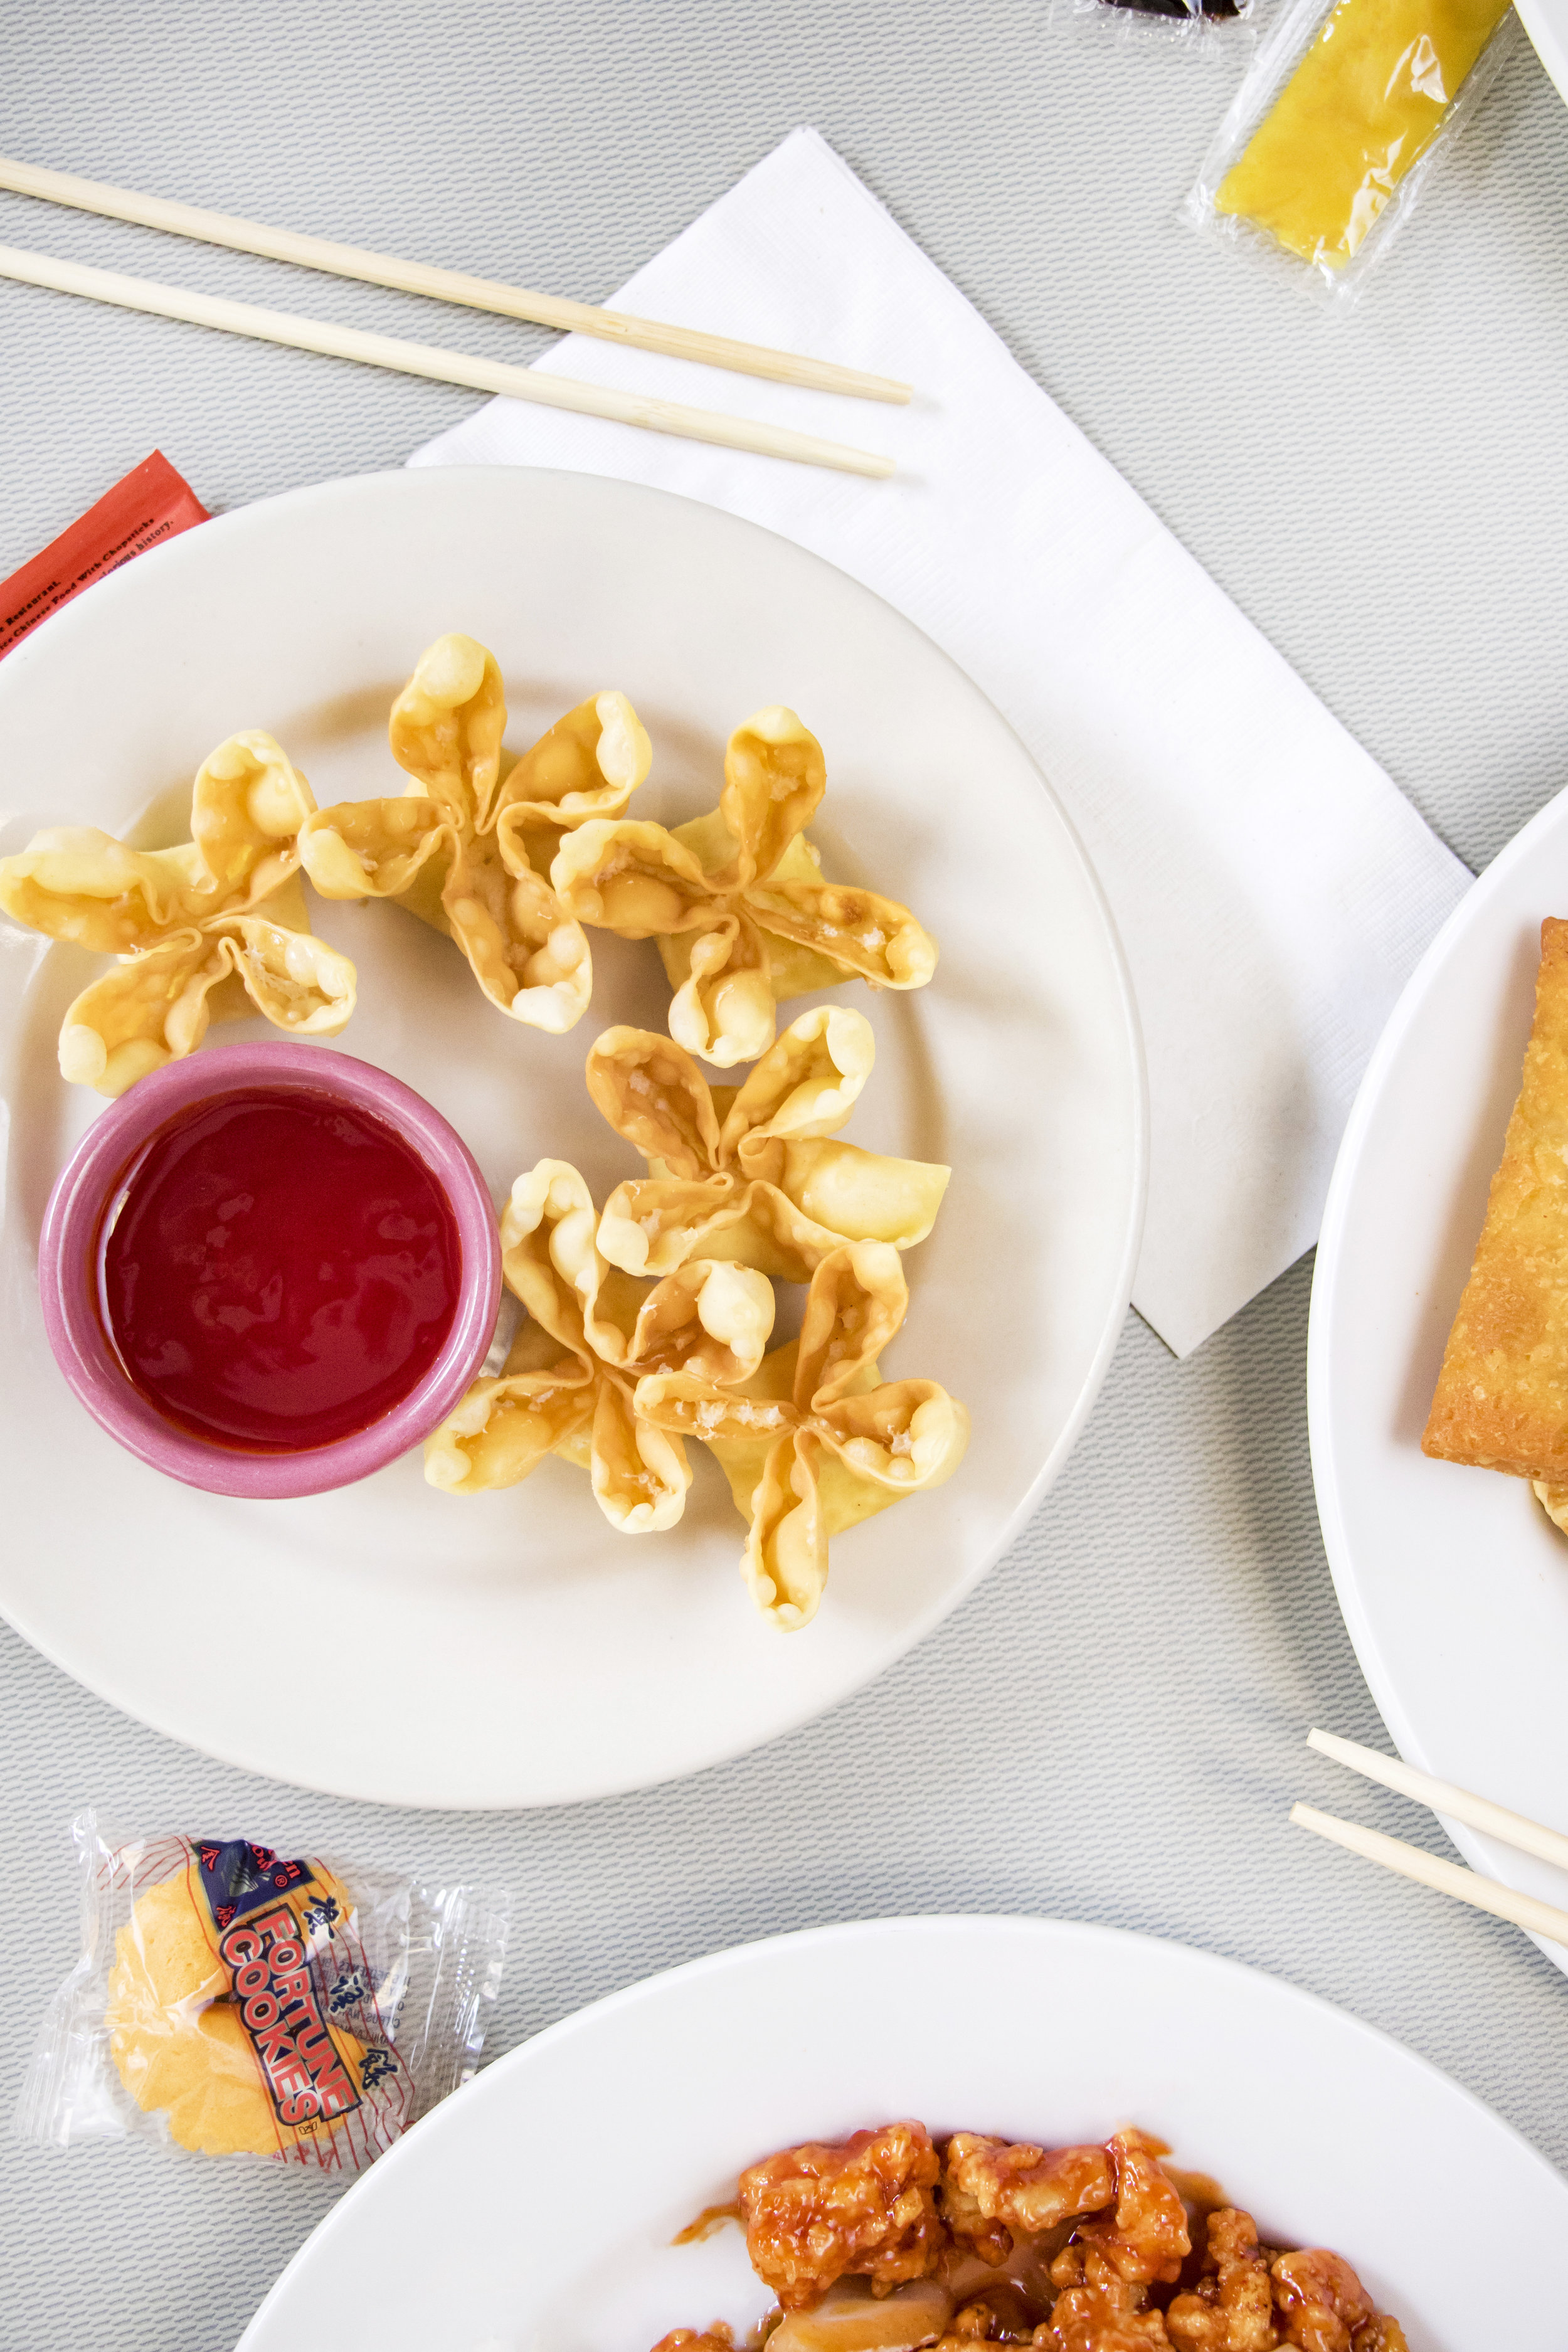 Cincinnati Food Photographer |Shans Jade Cafe |Crab Rangoon | Allison McAdams.jpg